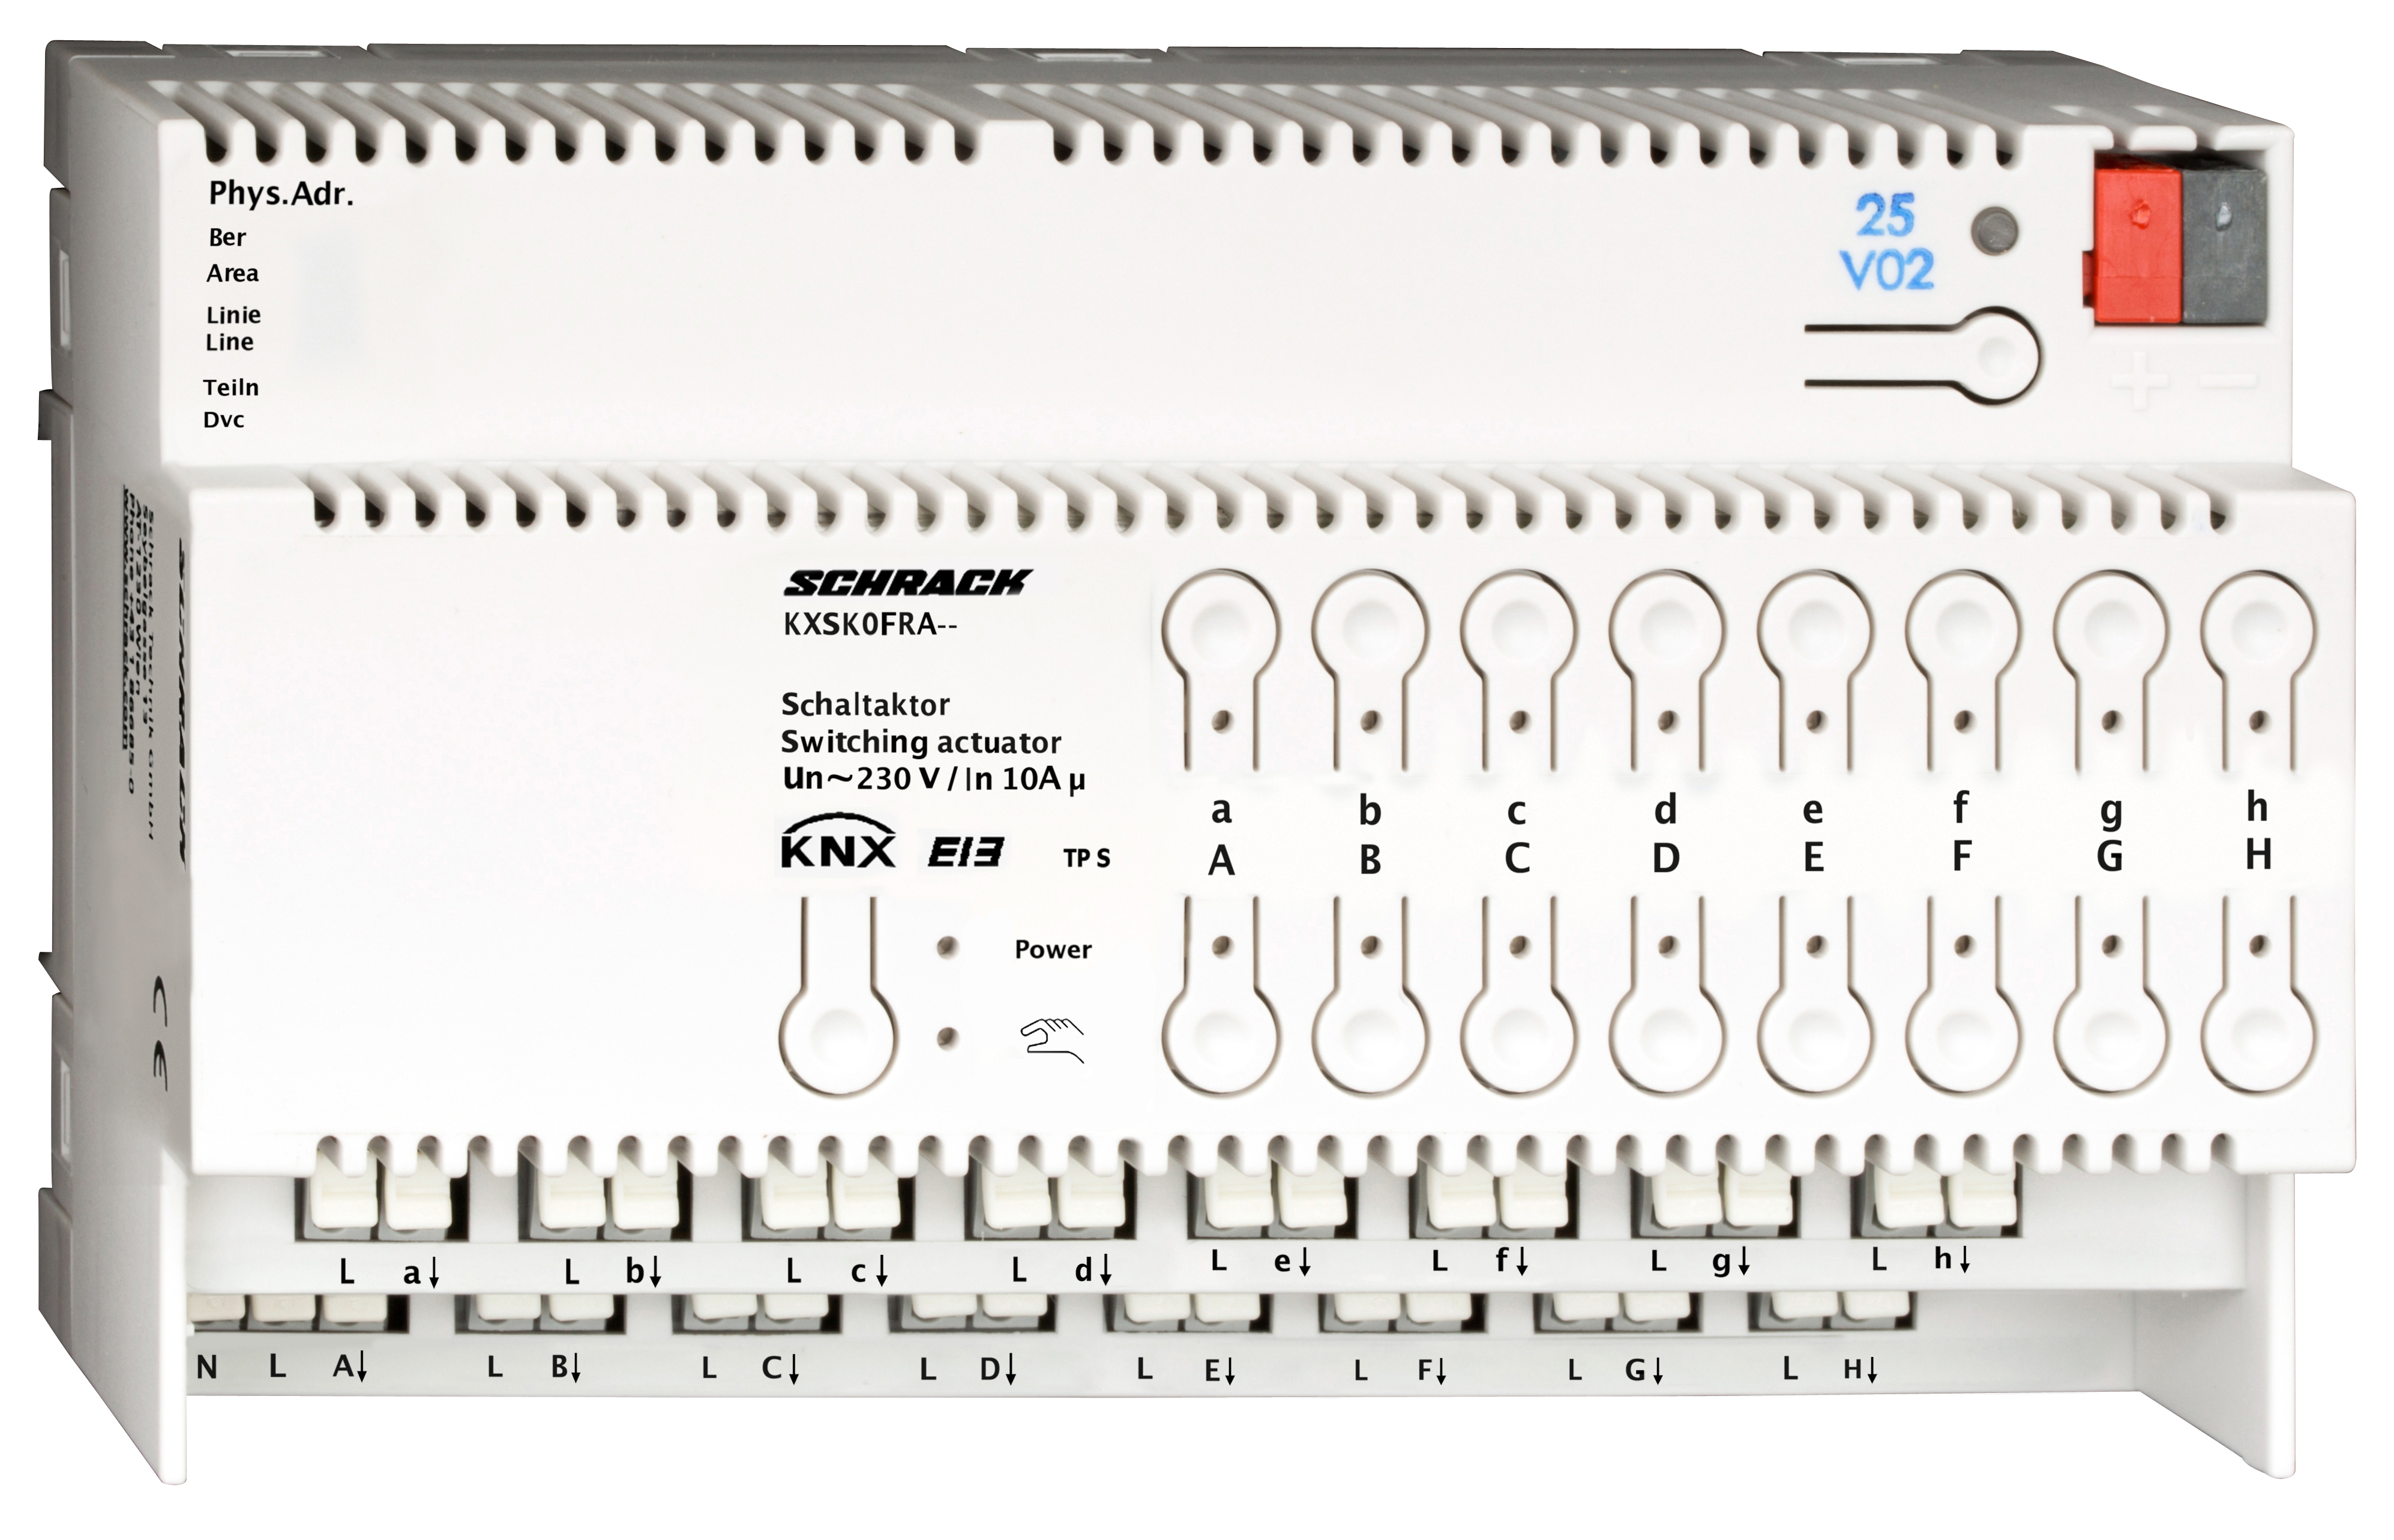 1 Stk KNX Schaltaktor, 16 x AC 230V, 10(16)A KXSK0FRA--